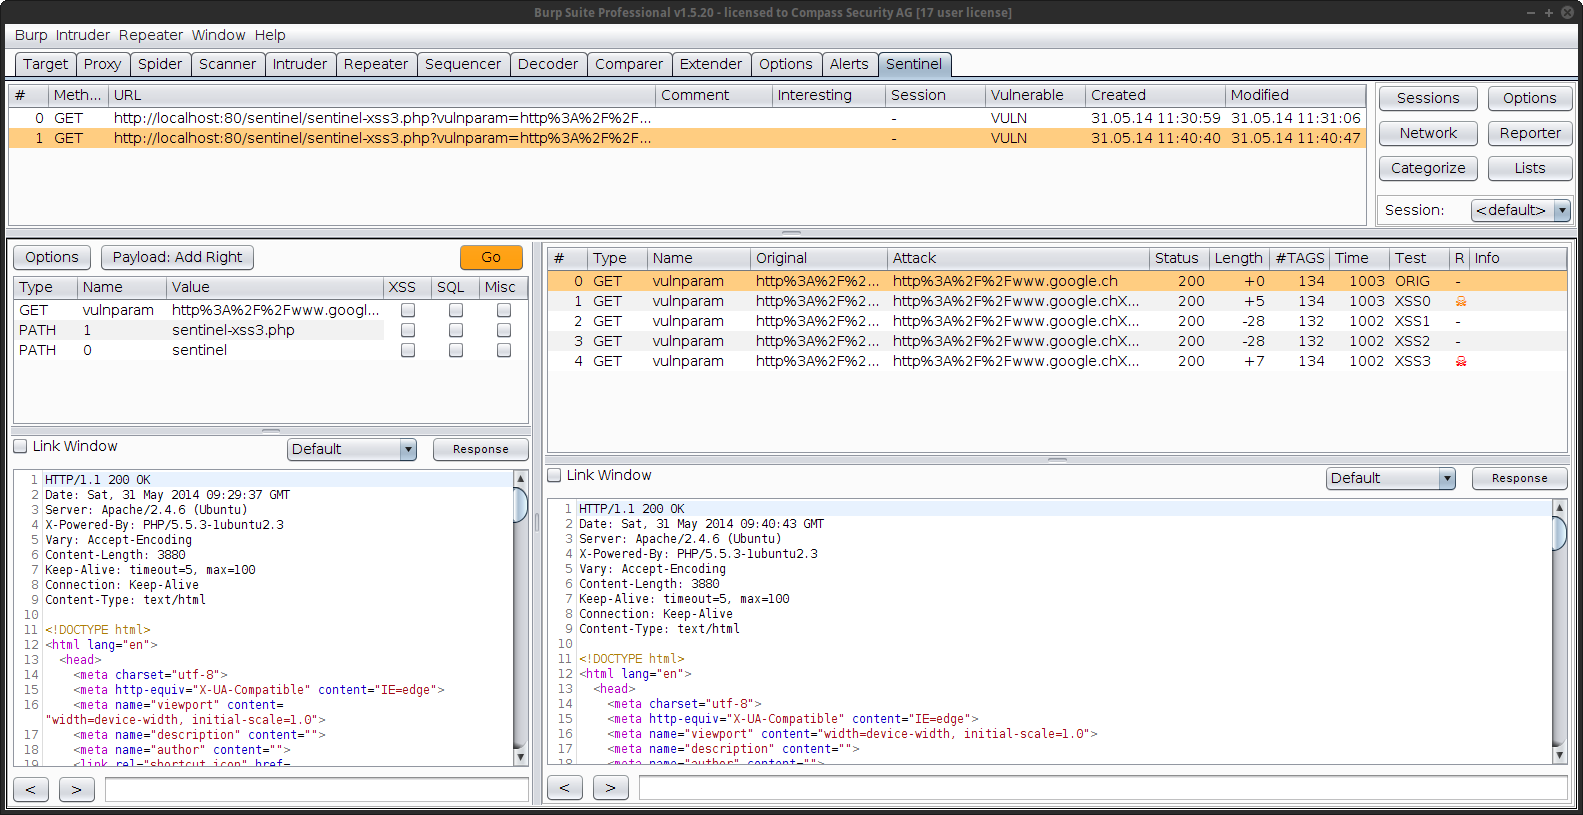 BurpSentintel - GUI Burp Plugin to ease discovering of security